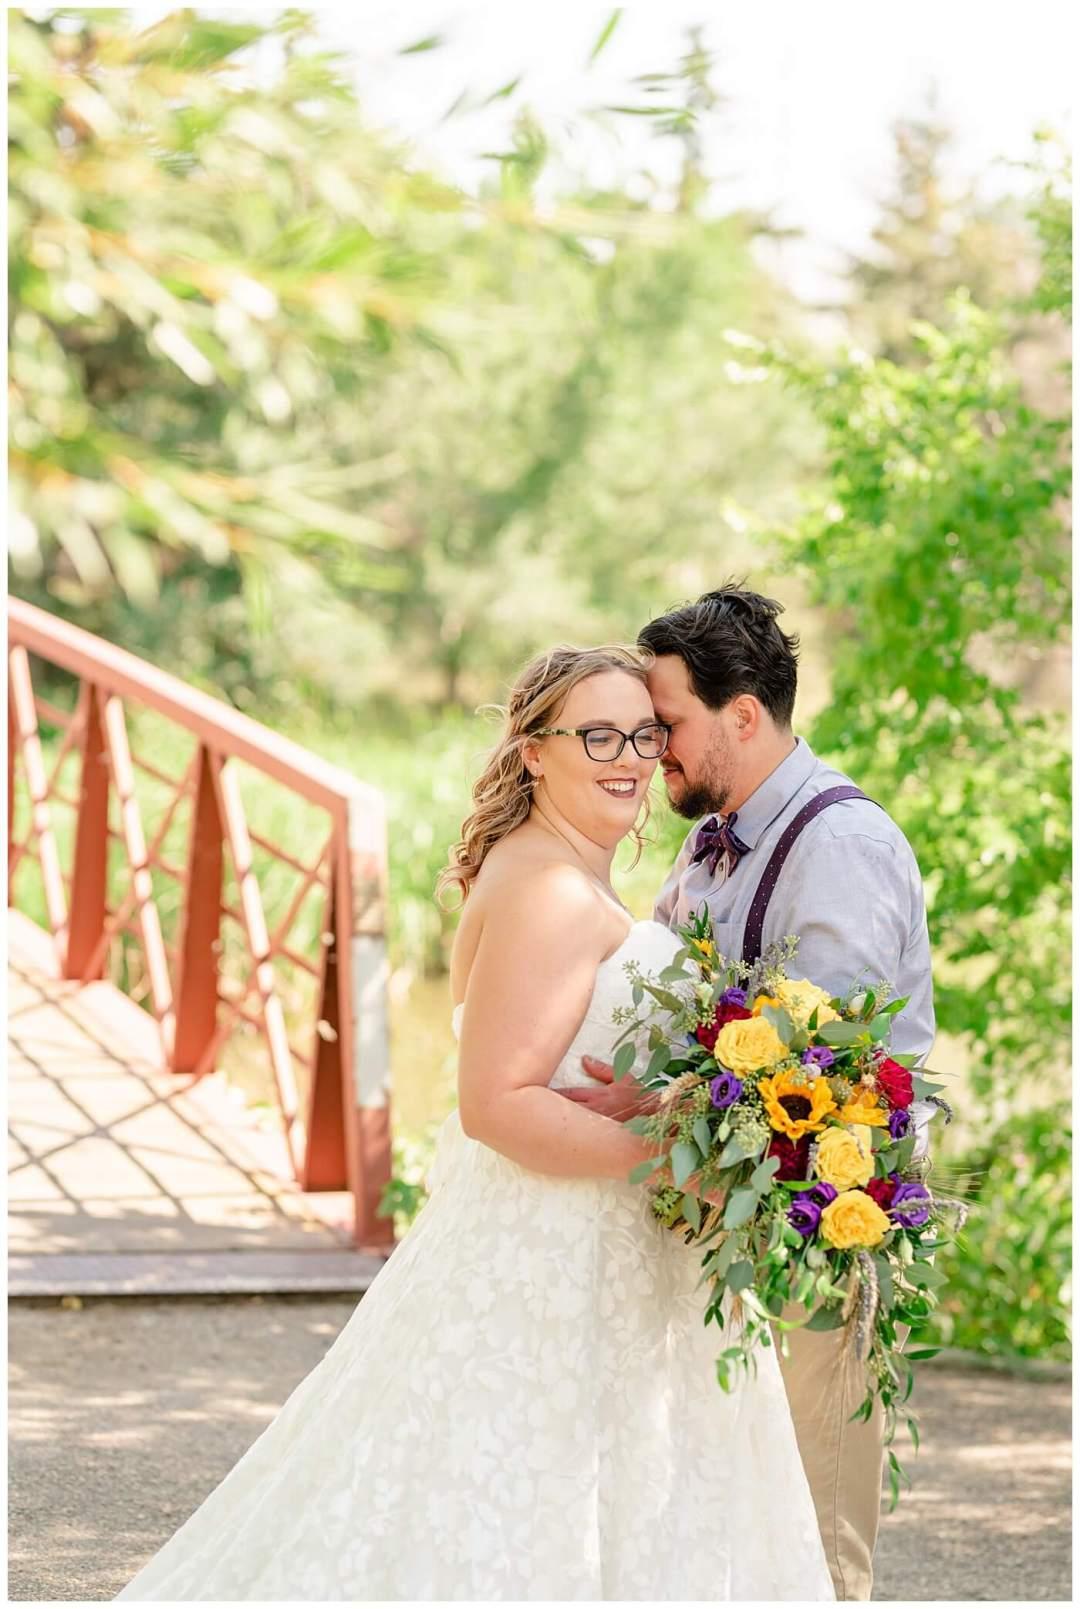 Regina Wedding Photographer - Ryan - Aeliesha - Bride & groom in front of the bridge of AE Wilson Park